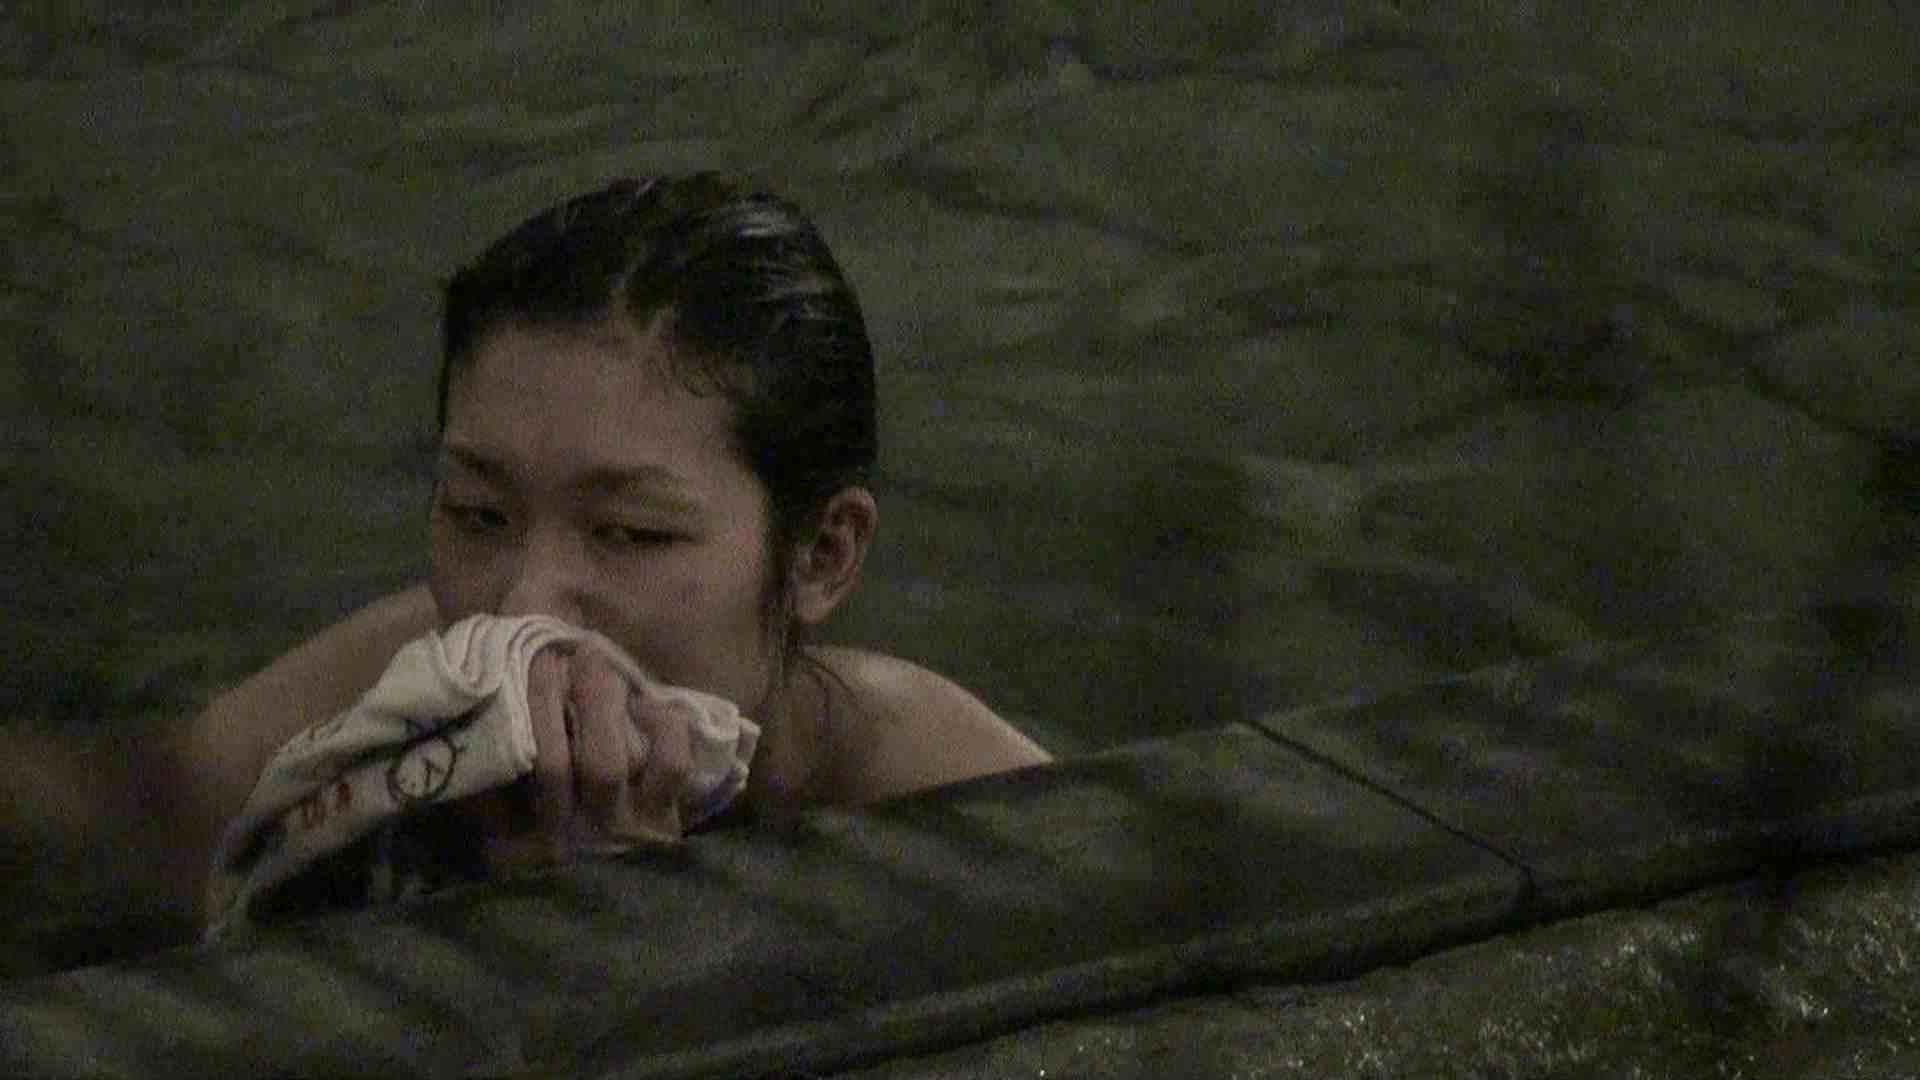 Aquaな露天風呂Vol.399 露天 おまんこ動画流出 67画像 14